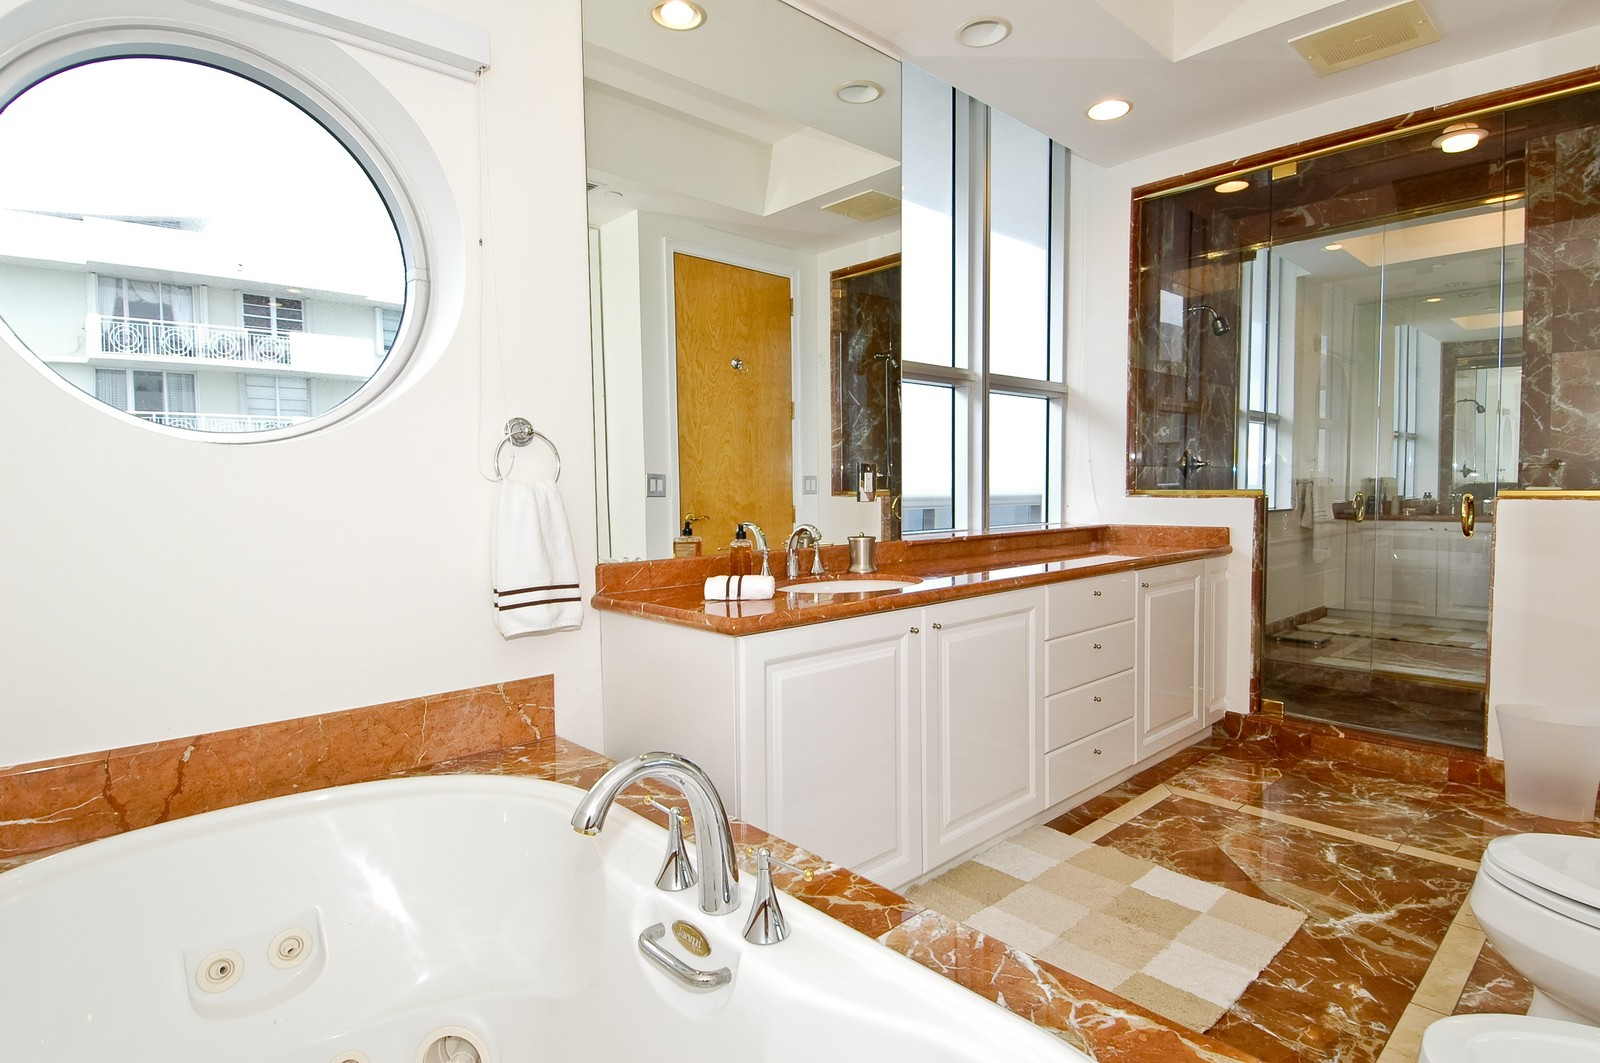 Real Estate Photography - 5801 Collins Ave, PH 1500, Miami Beach, FL, 33140 - Master Bathroom